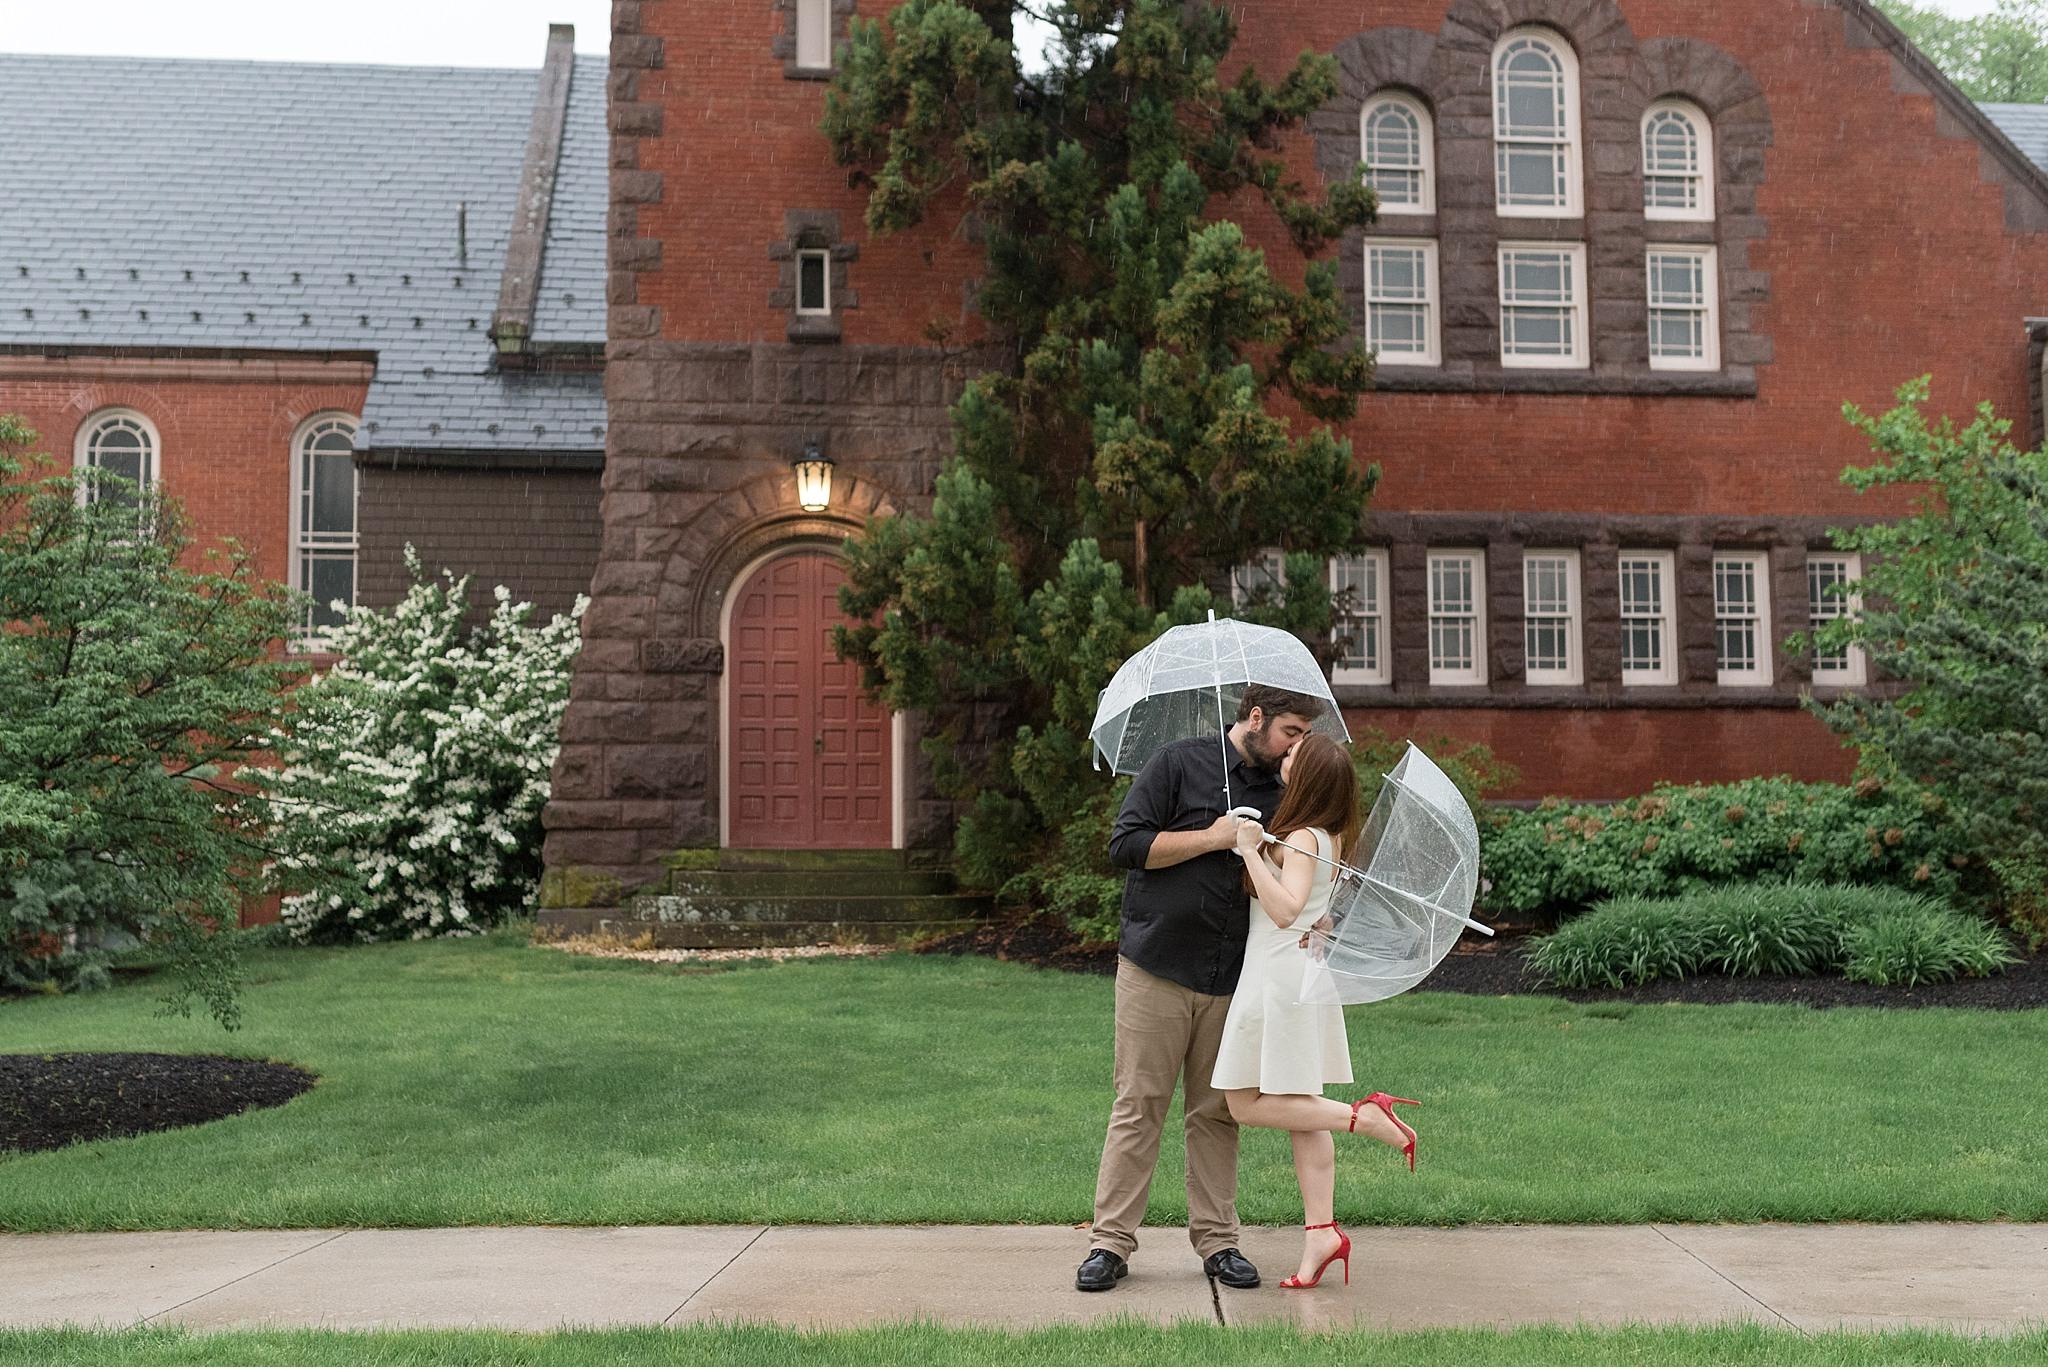 Rainy spring engagement session Gettysburg College Campus Wedding Photography Photo_1508.jpg